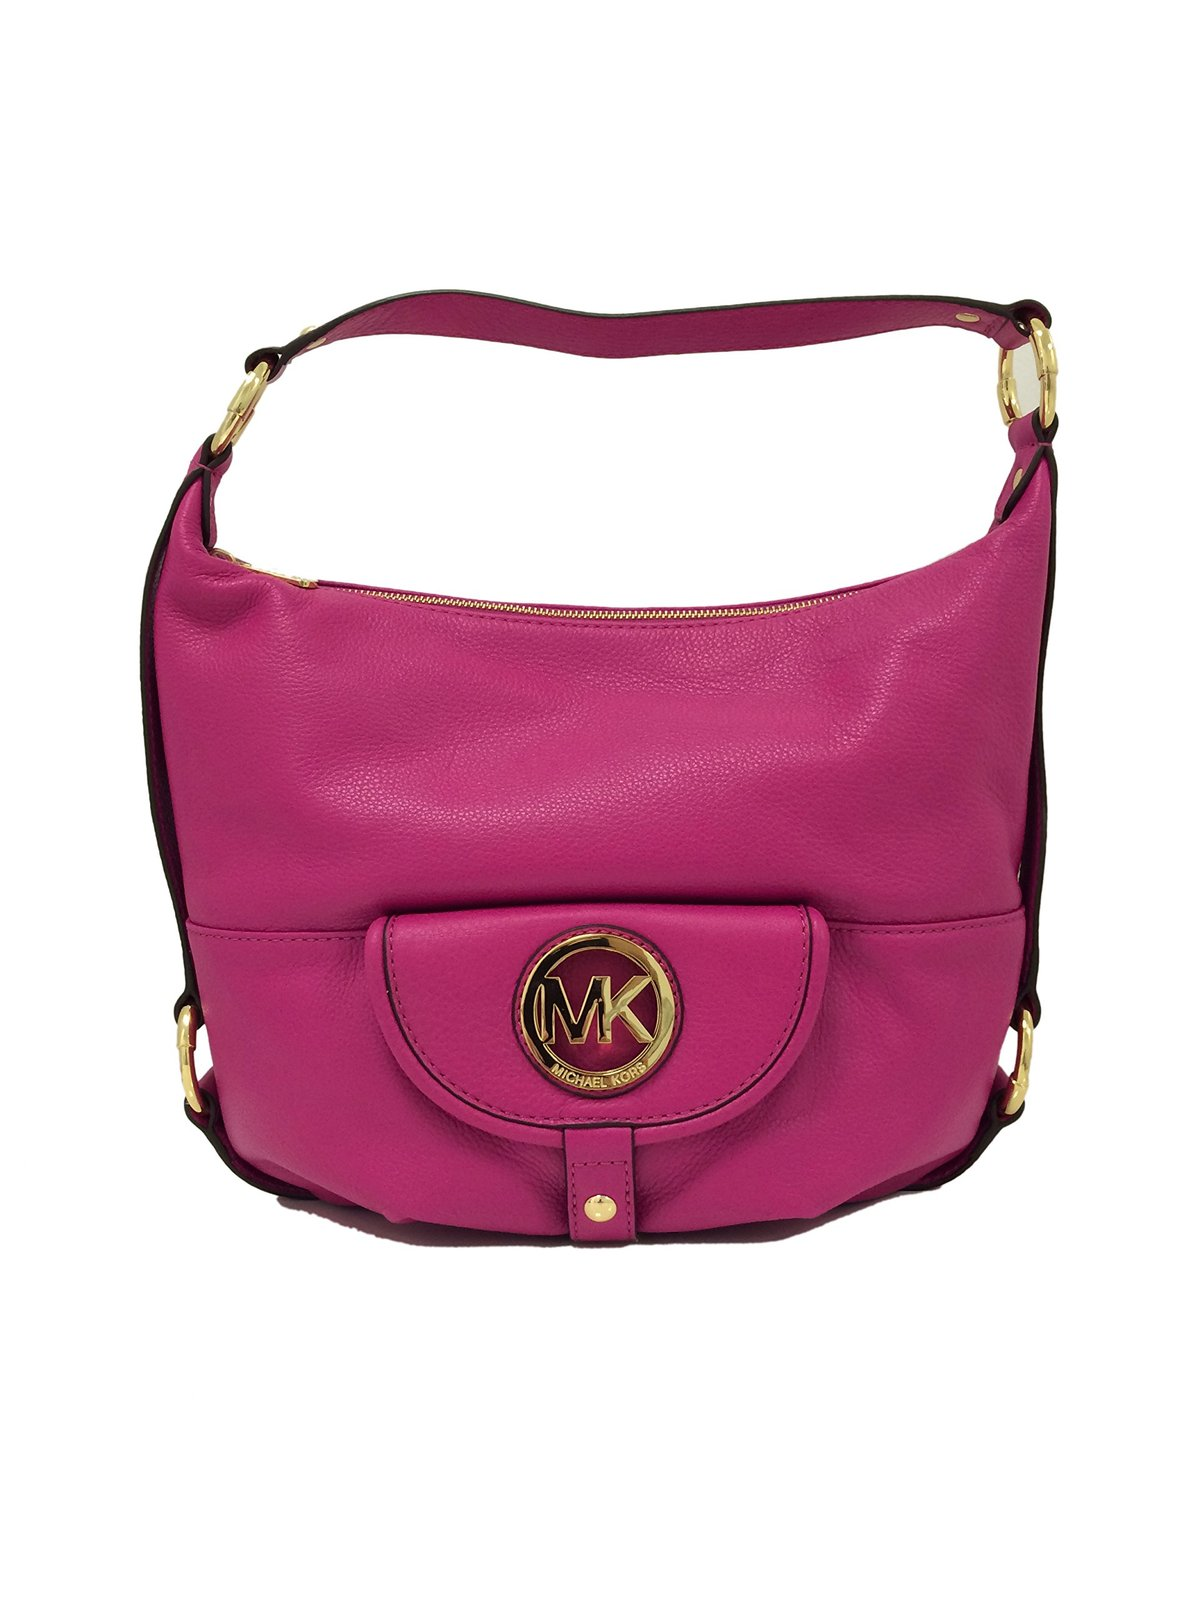 59d9322be819 Michael Kors Fulton Large Fuschia Pink and 50 similar items. 81sbj6ohkzl